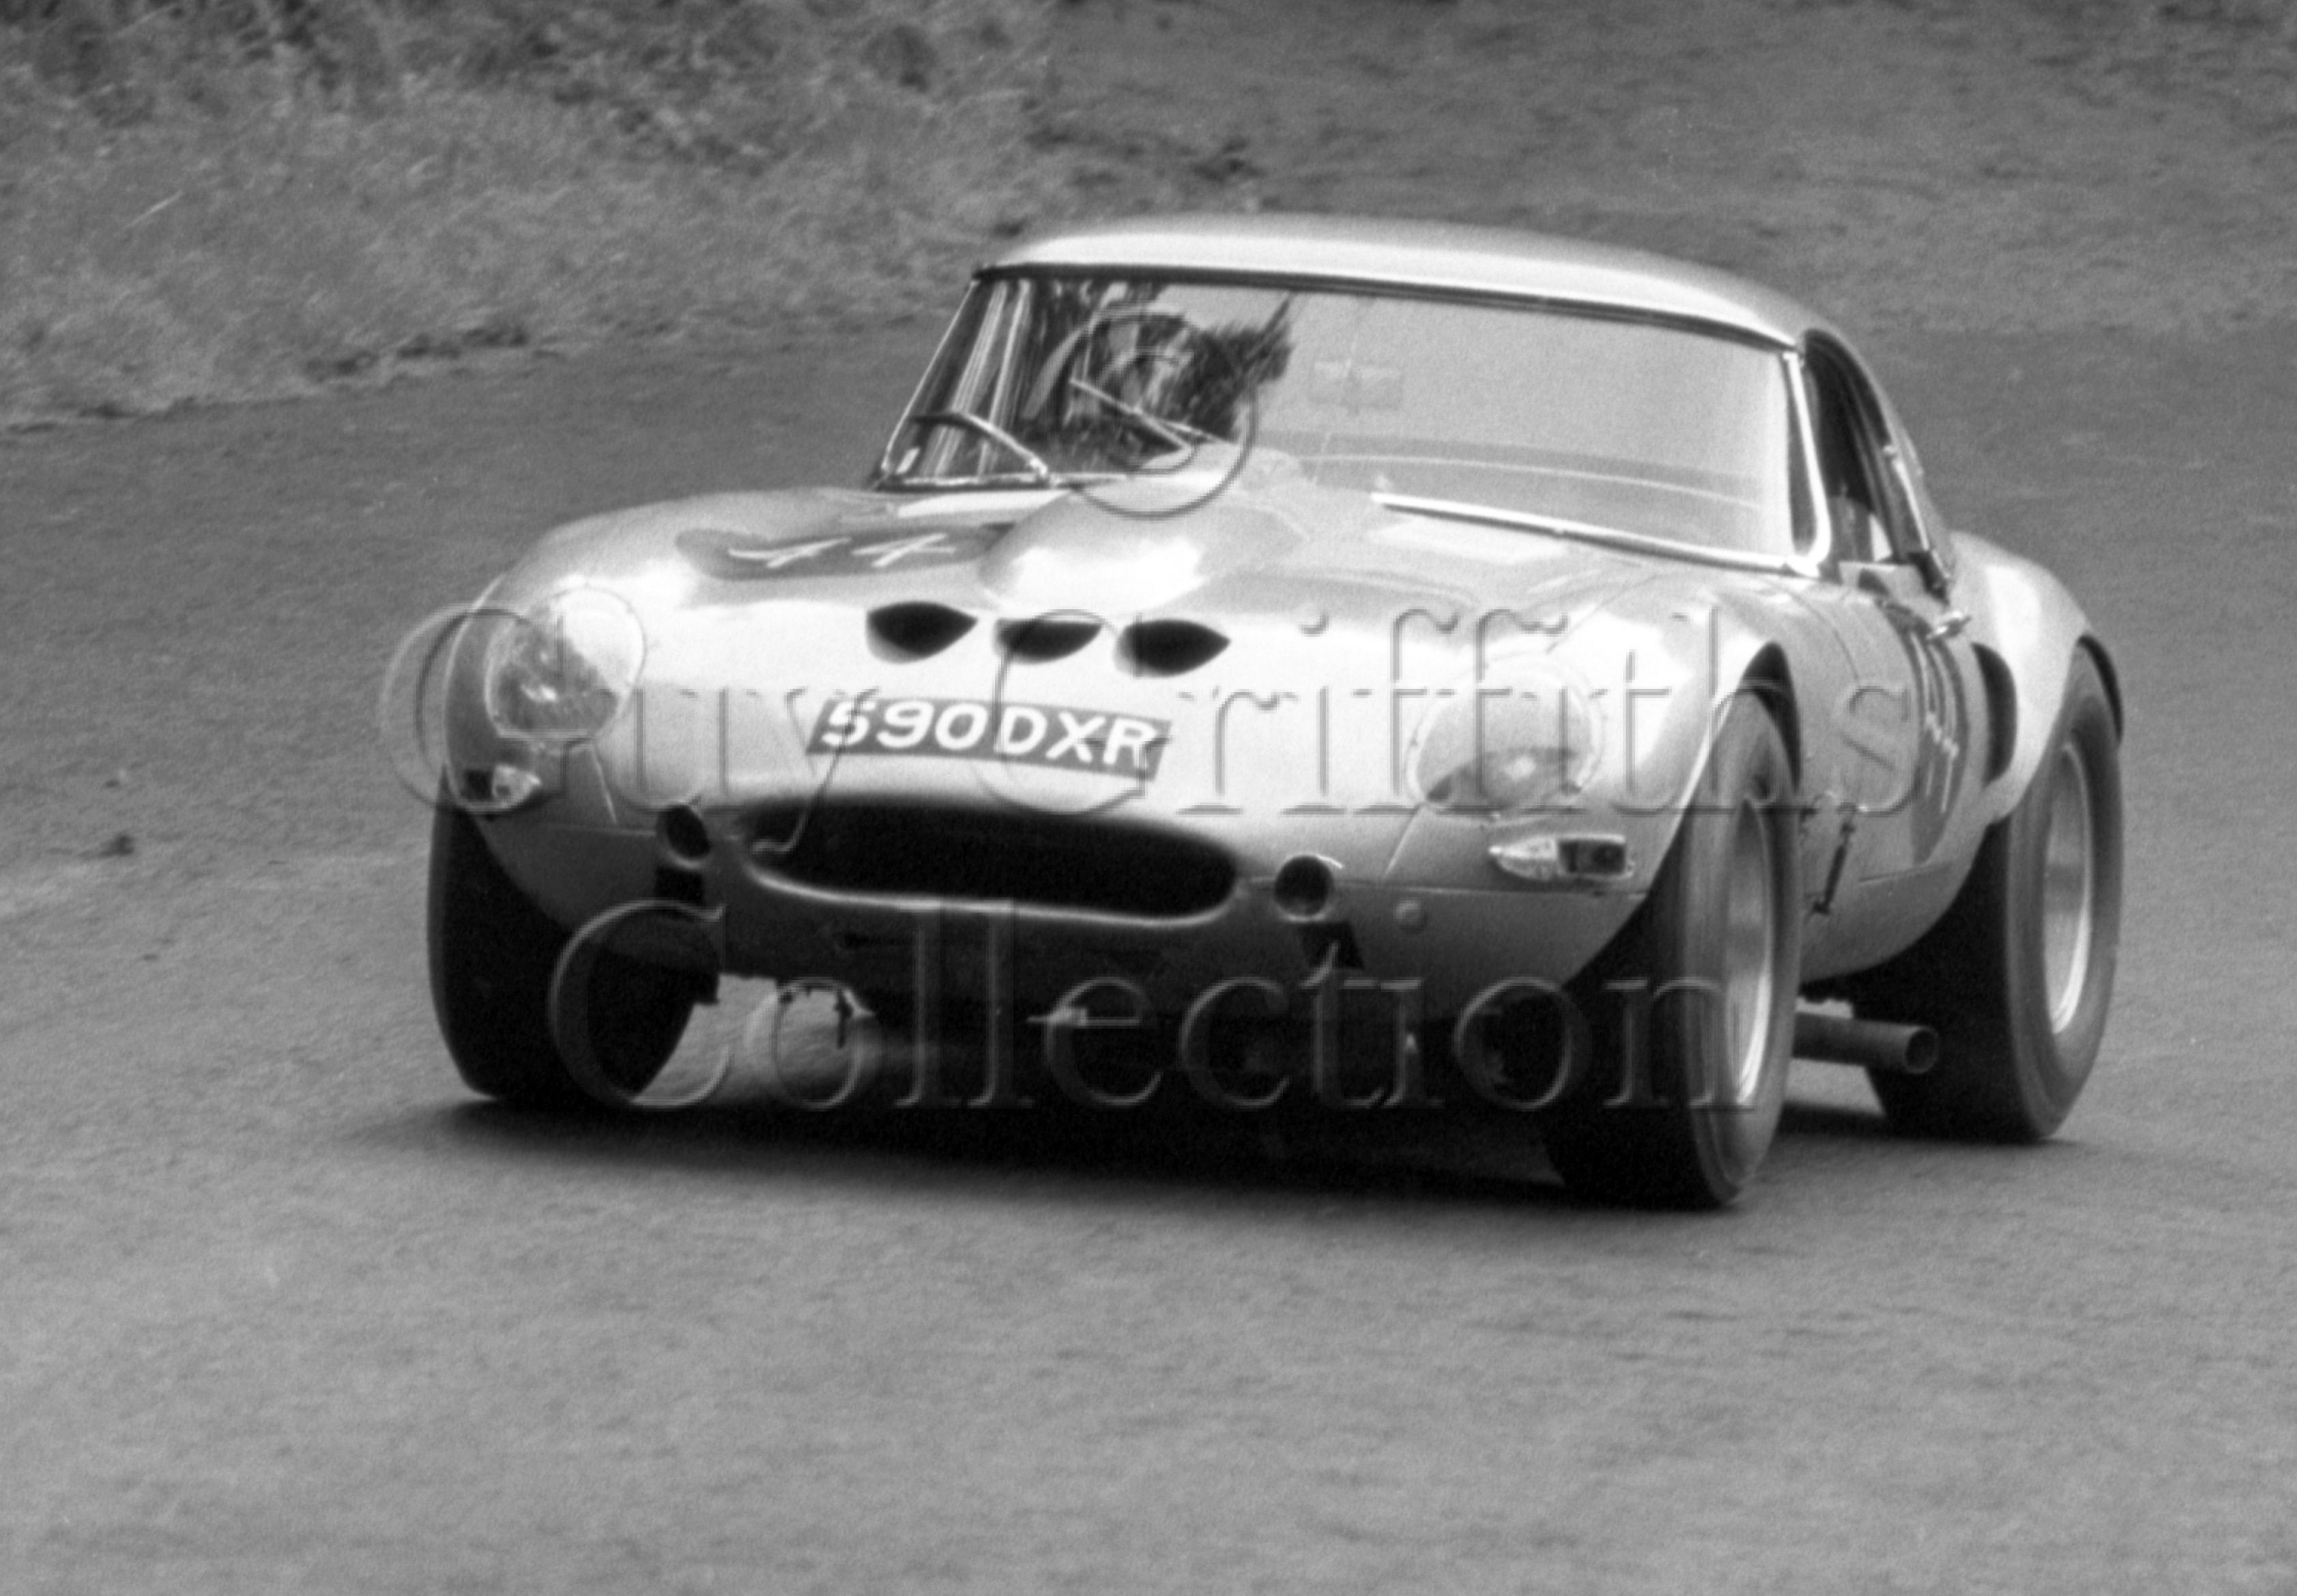 109-684–B-R-Williams–Jaguar-Egal-590-DXR–Shelsley-Walsh–14-07-1968.jpg - Guy Griffiths Collection